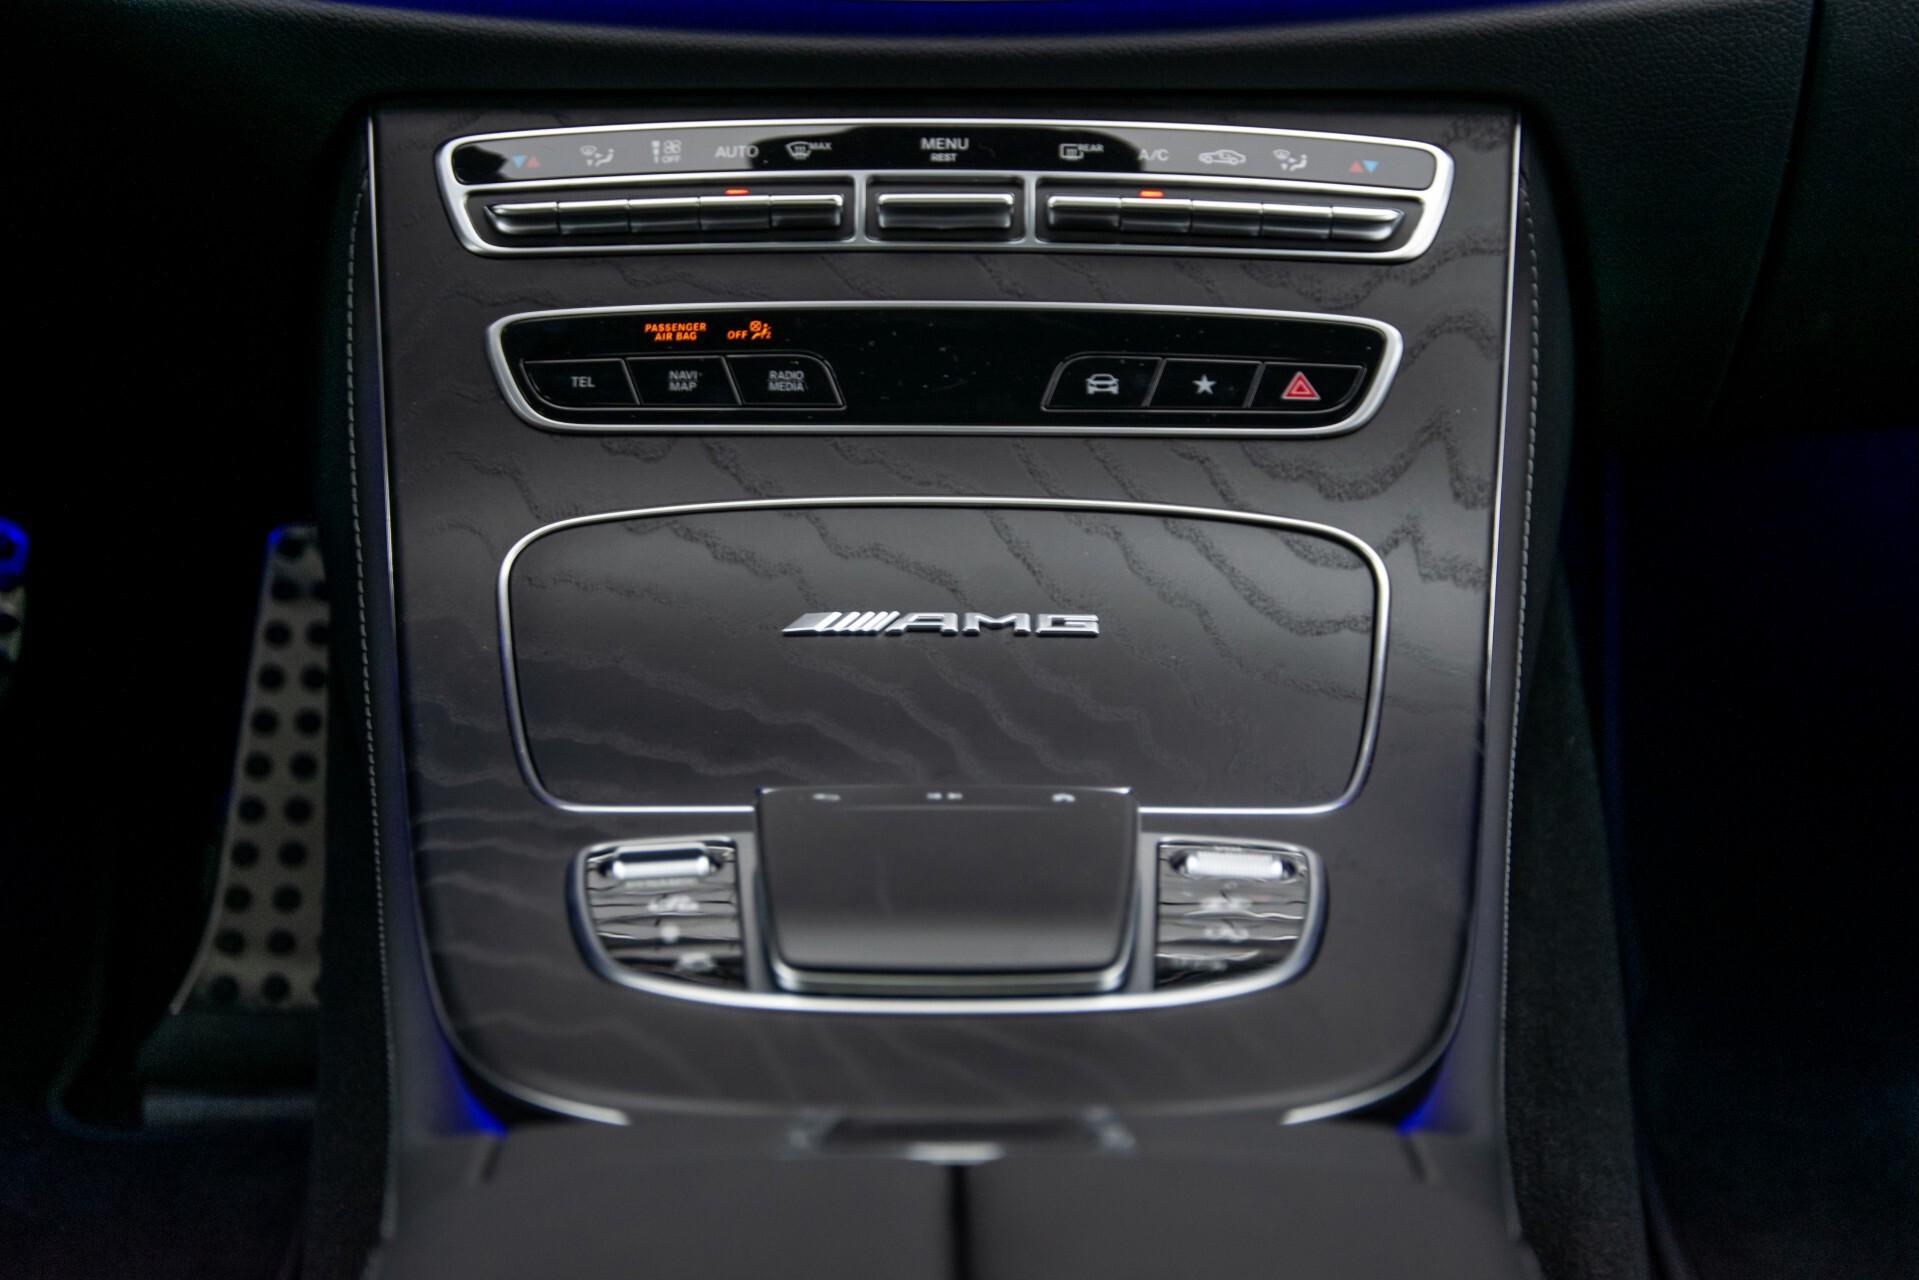 Mercedes-Benz E-Klasse 63 S AMG 4M+ NIEUW MODEL Night/Massage/Rij-assist/Keyless/Hud Aut9 Foto 18